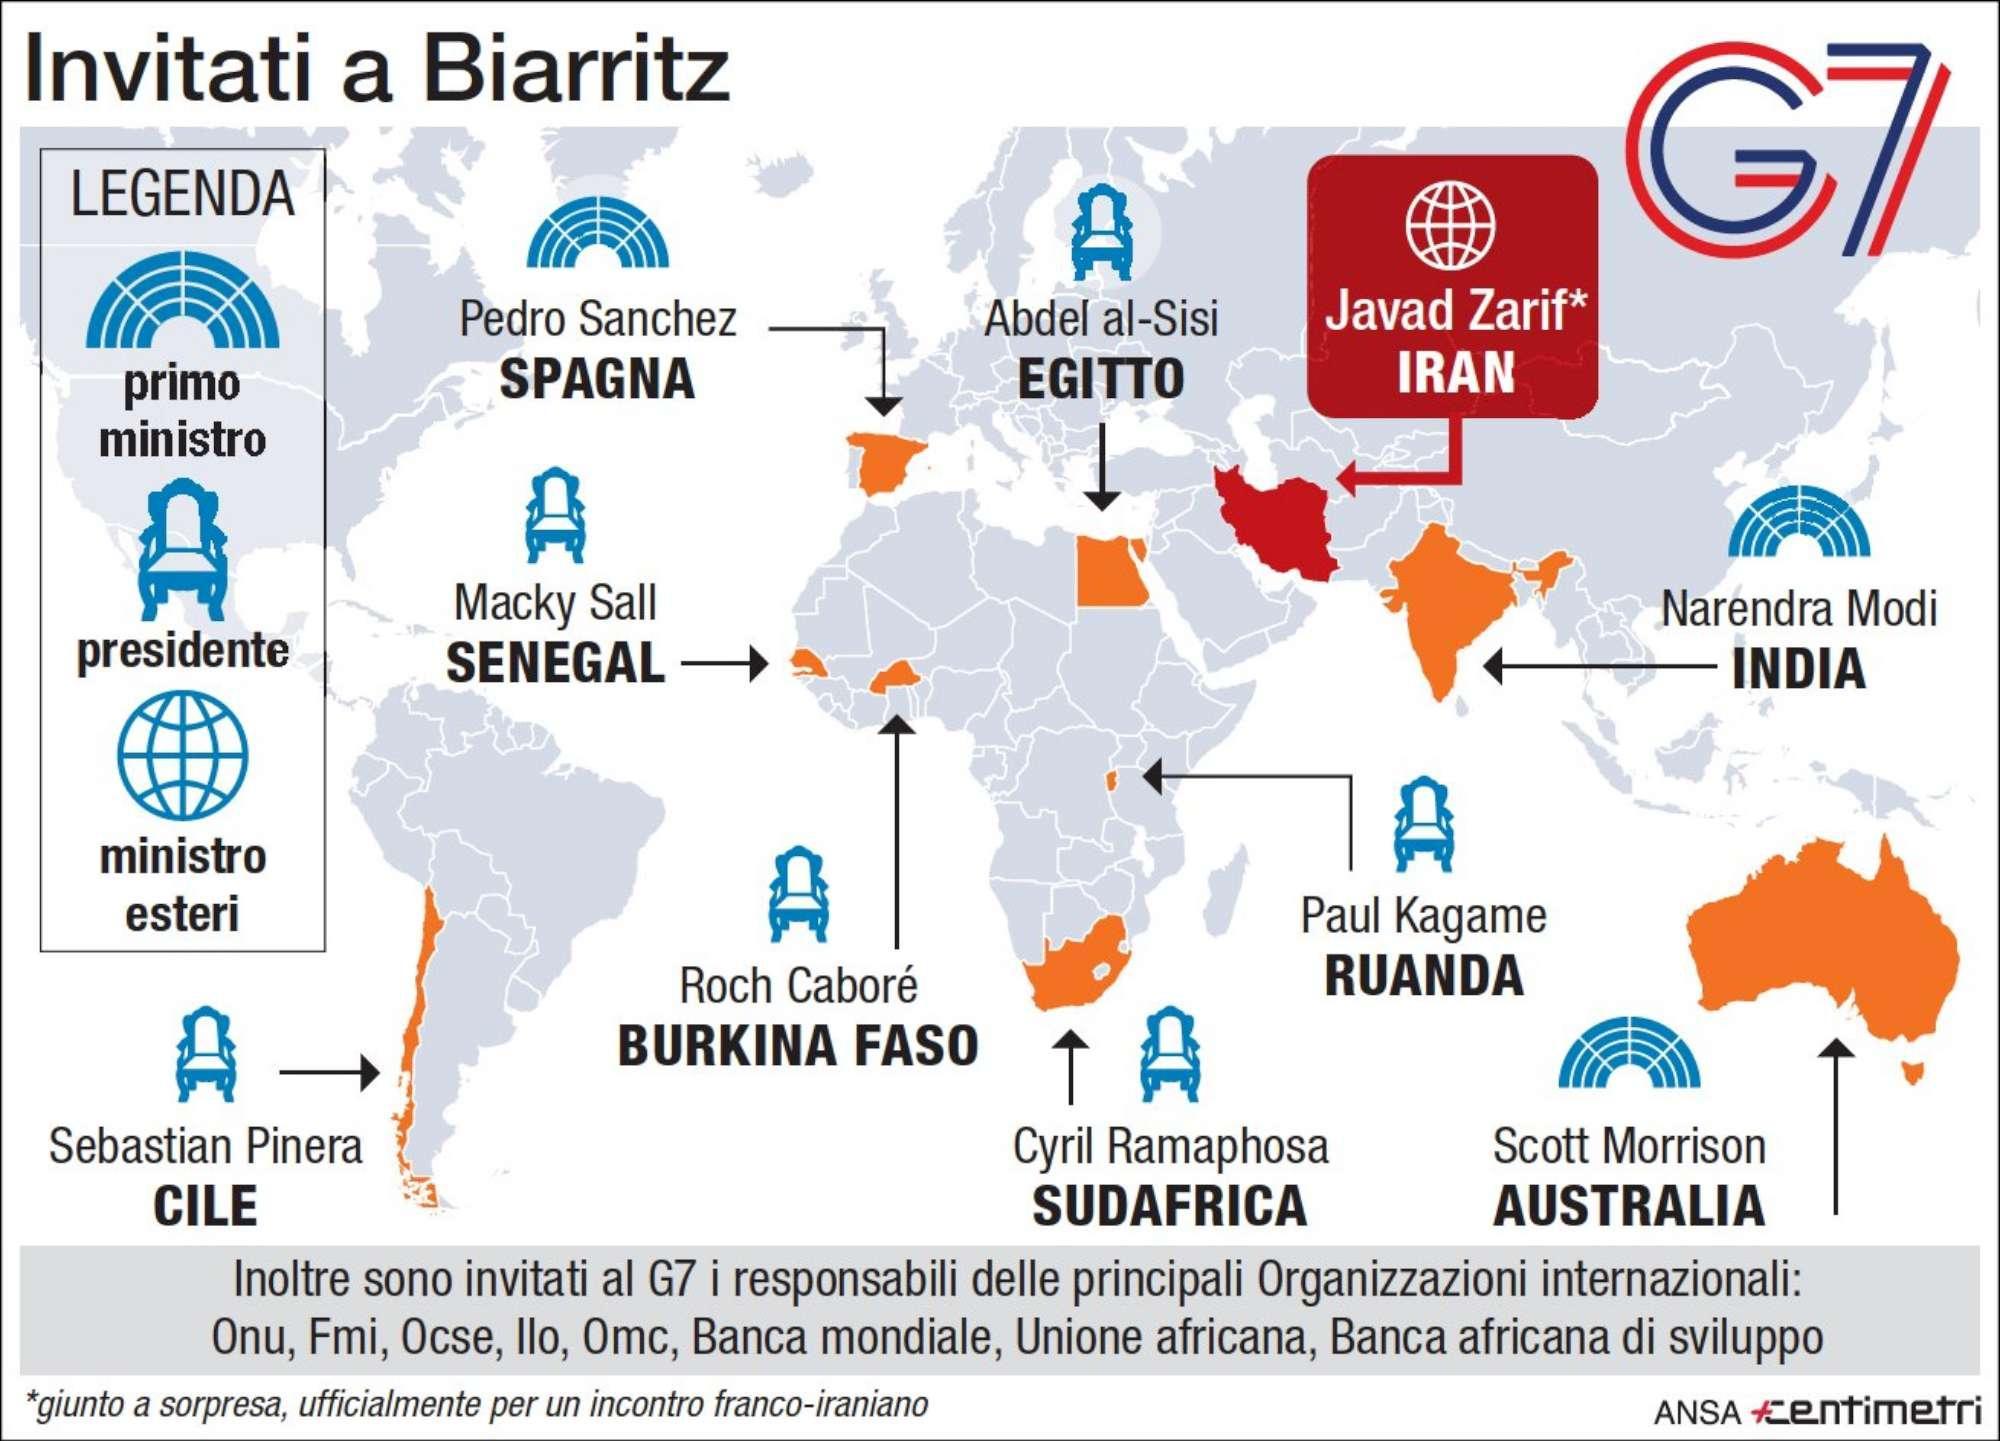 Tutti gli invitati al G7 di Biarritz